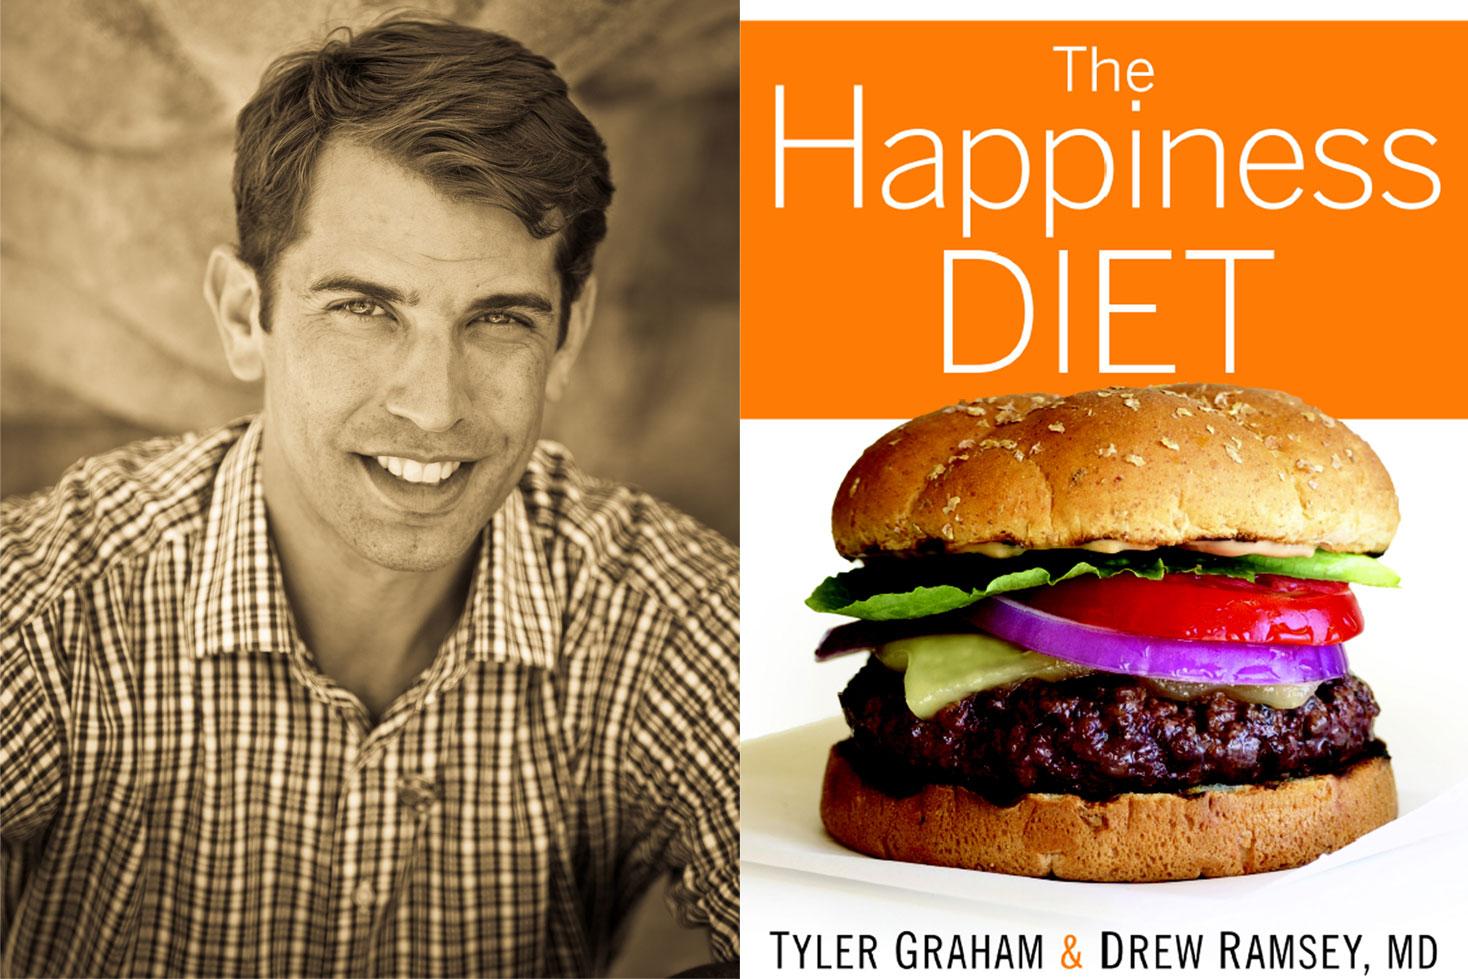 drew-ramsey-happiness-diet